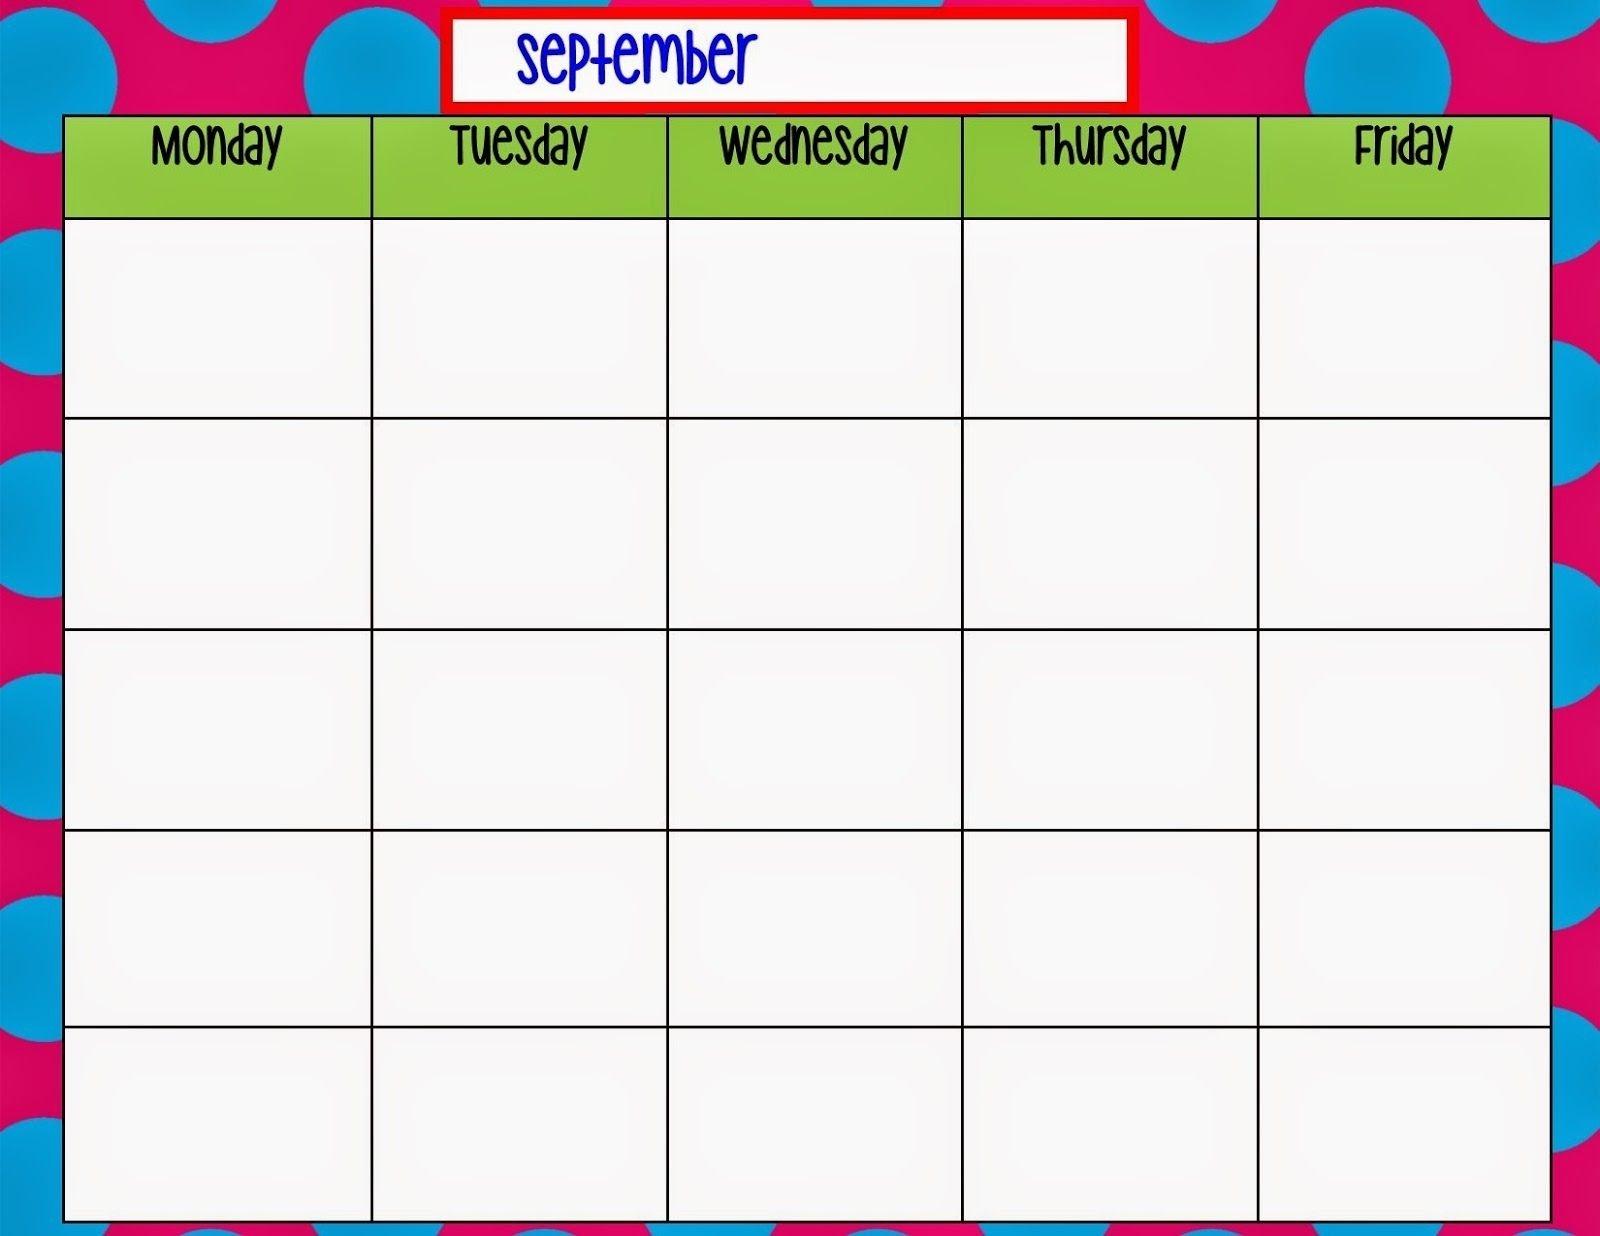 Monday Through Friday Schedule Printable – Calendar Lined Monday Through Friday